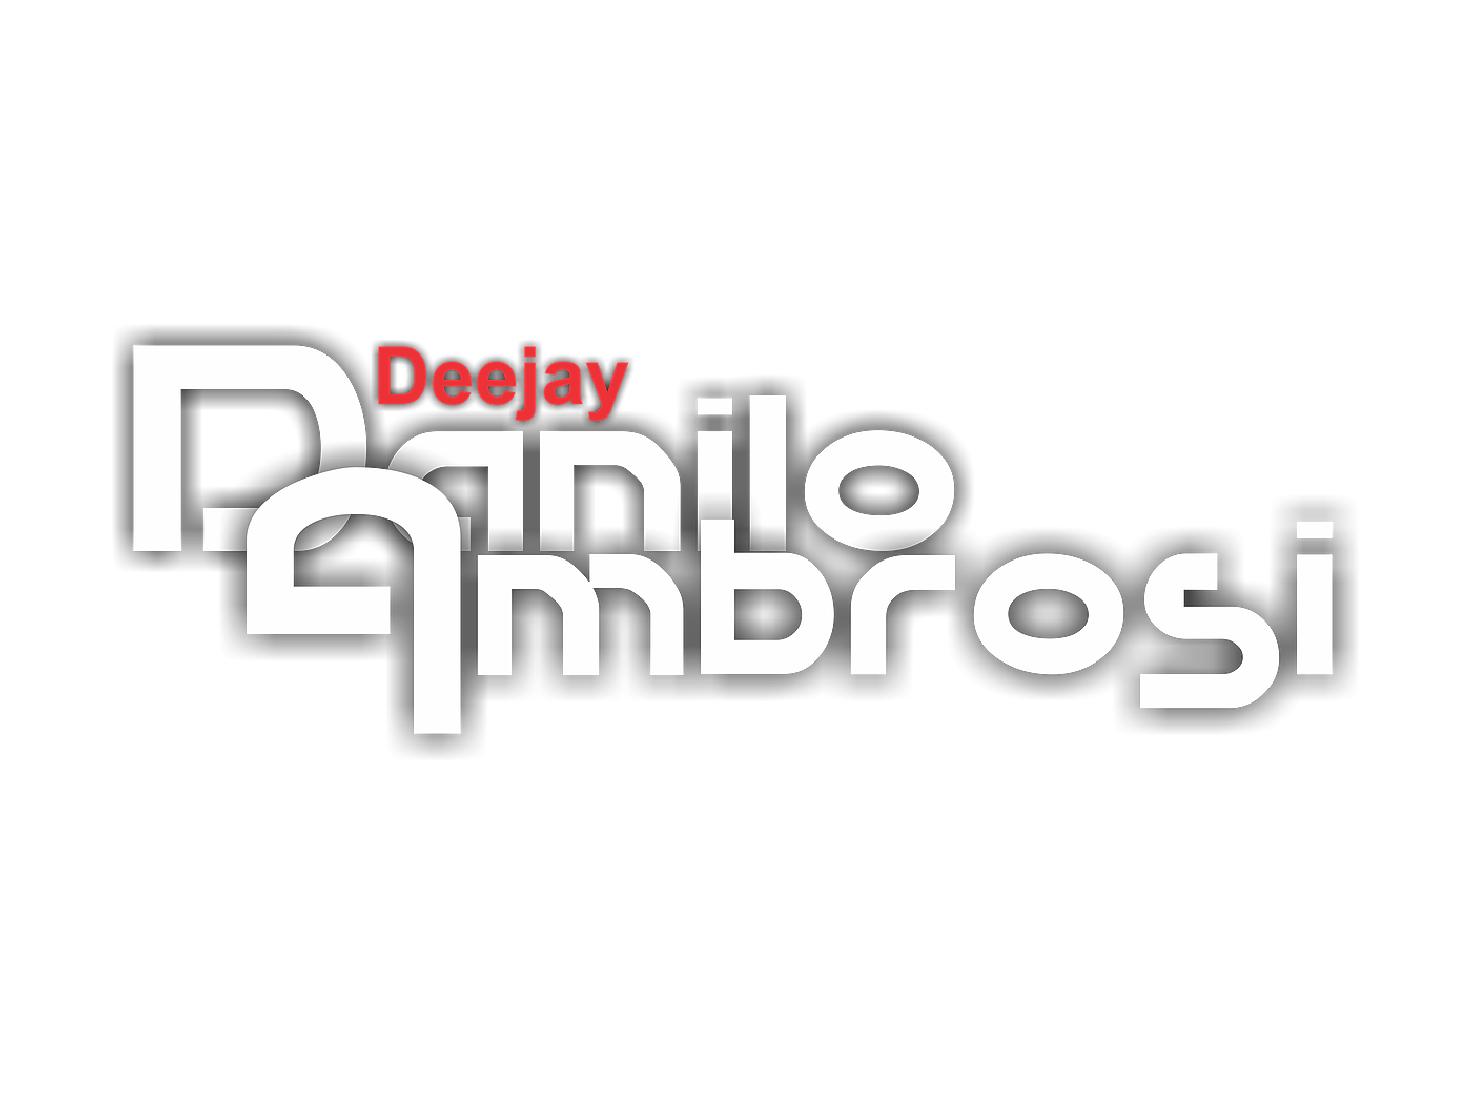 Dj Danilo Ambrosi